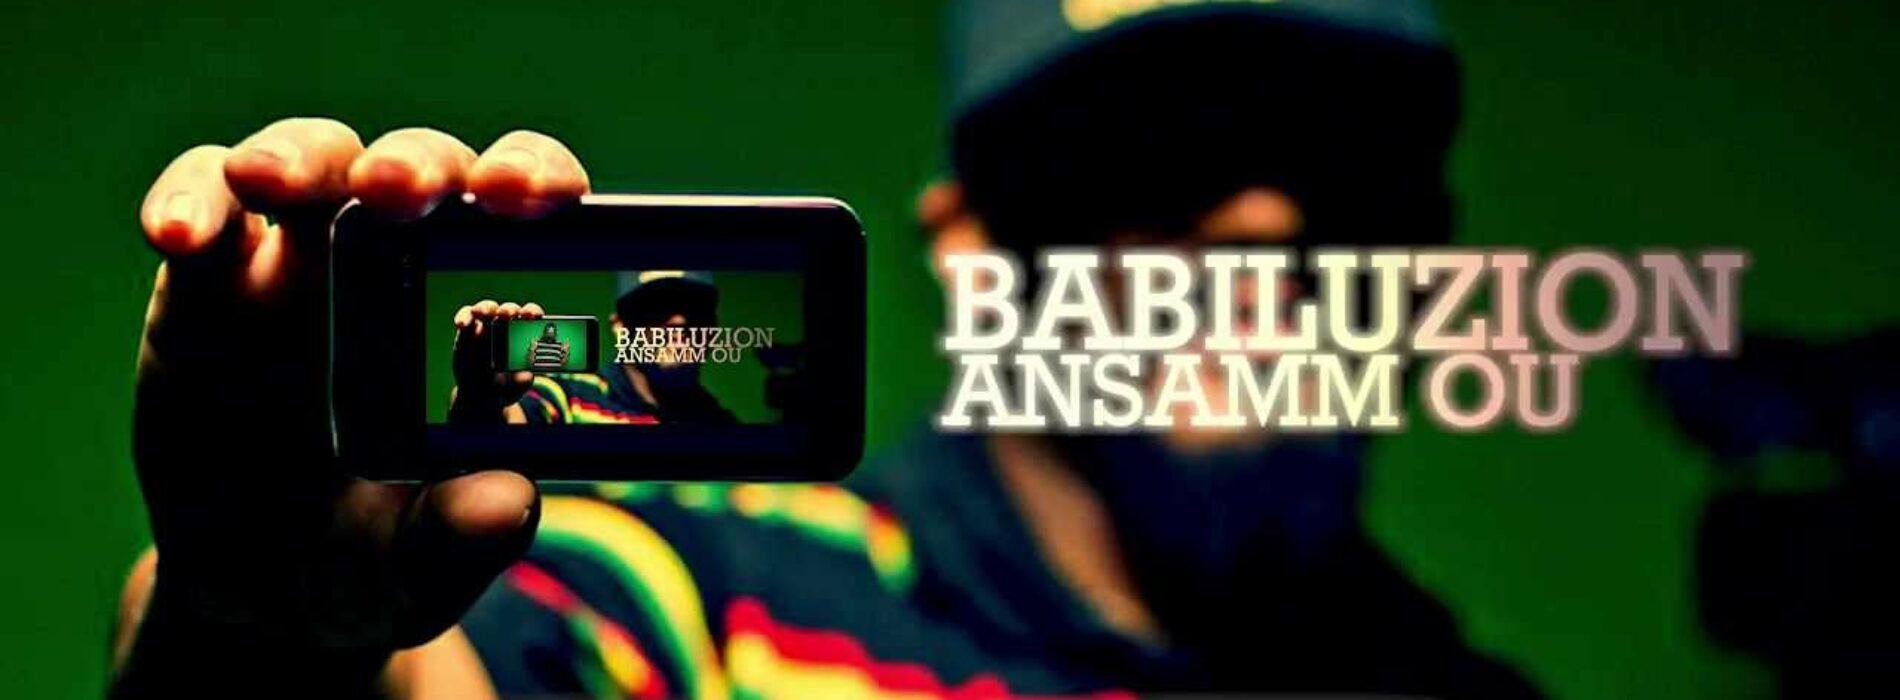 "BABILUZION nous offre 6 titres ""Fé KOM MWIN"" – ""MINA WONDA"" – PASS LO MESAZ – RESS DOBOUT' – MOVING ON – ""ZAZAKEL"" – Avril 2021"